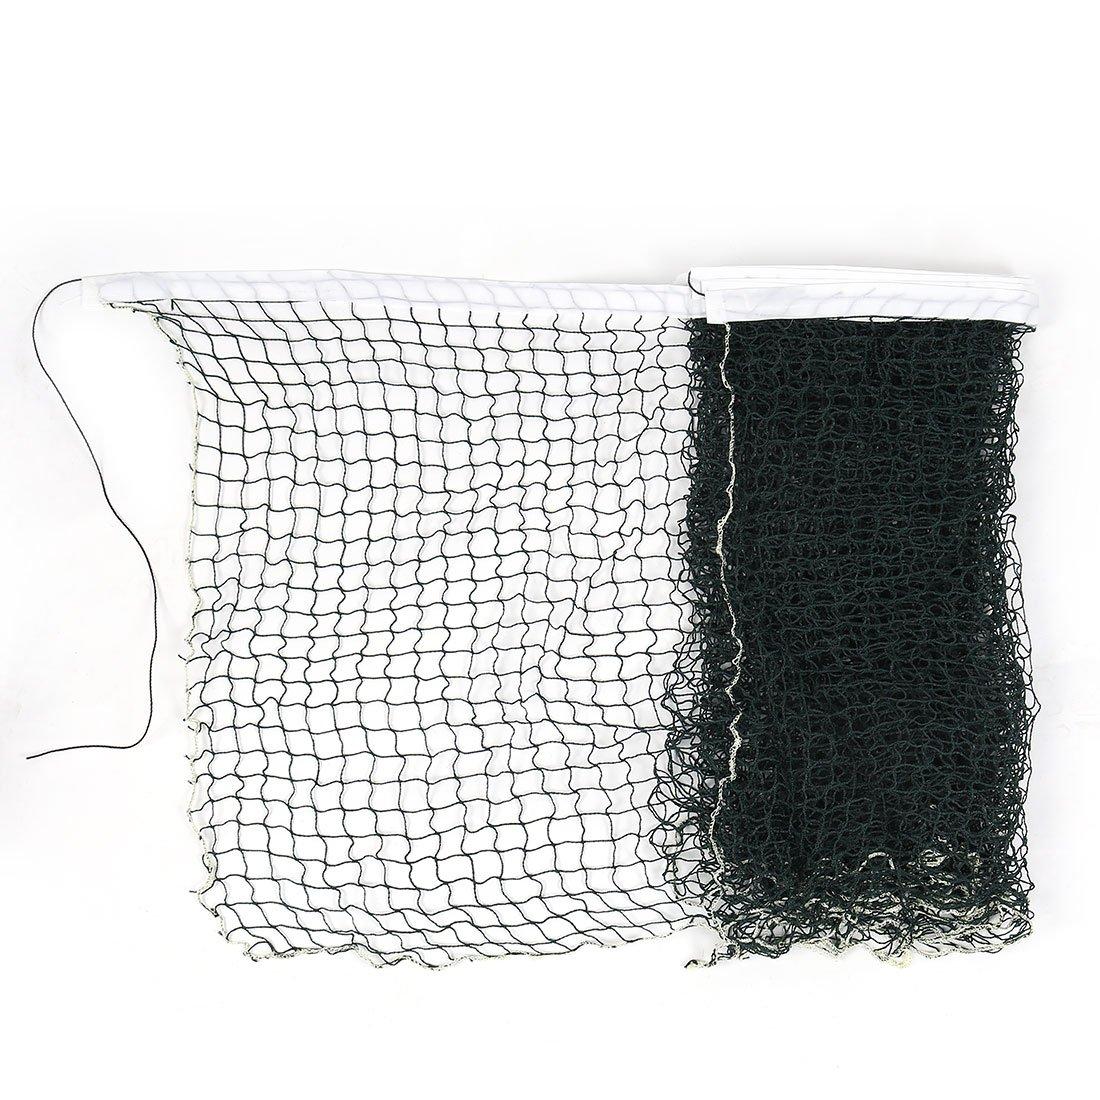 6M Length White Trim Braided Nylon Green Mesh Badminton Training Net Sourcingmap a11101000ux0061